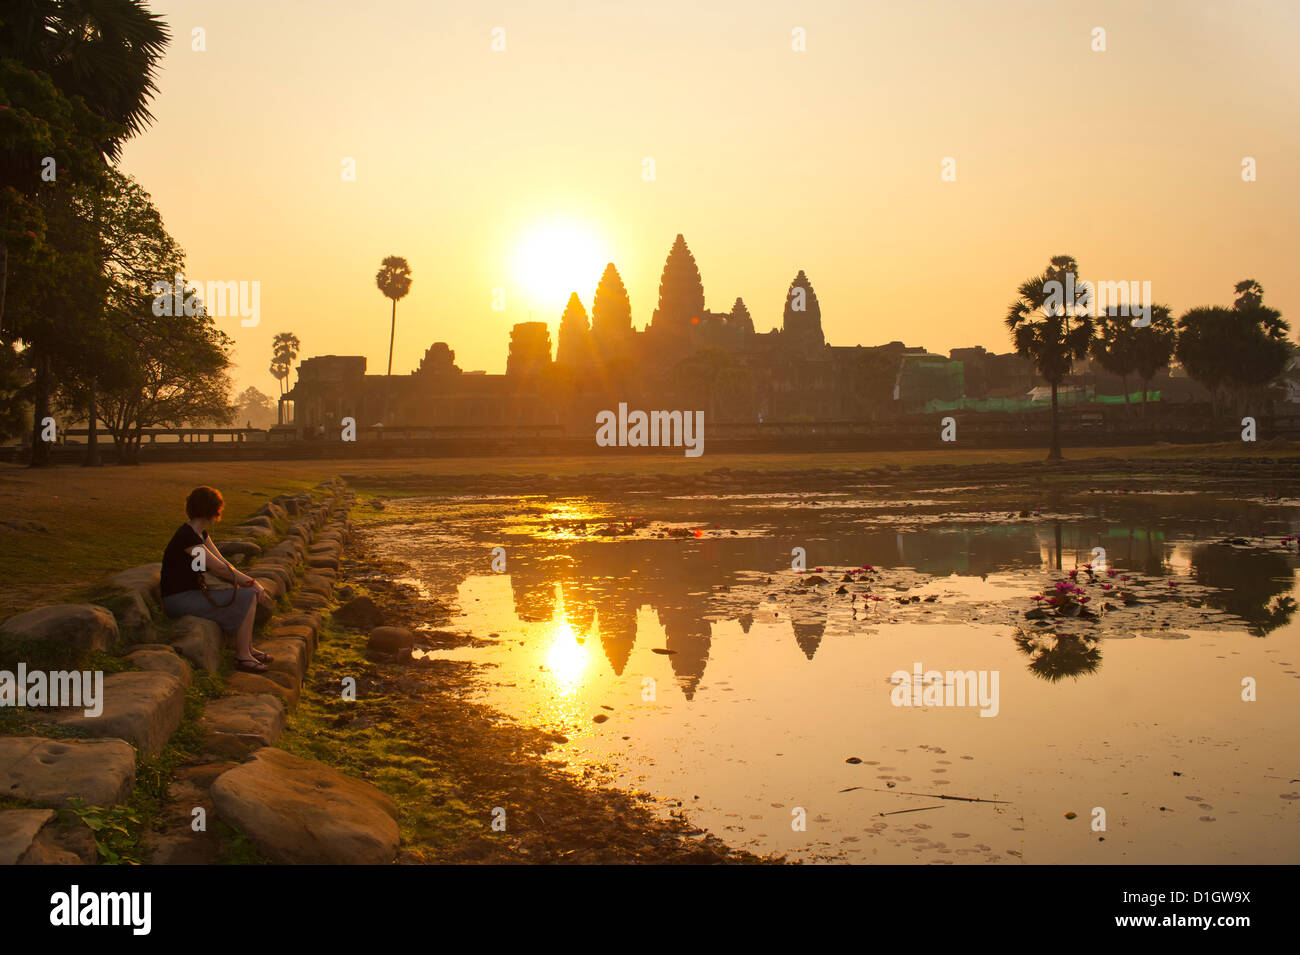 Touristen, die gerade Sonnenaufgang am Tempel Angkor Wat, Angkor Tempel, Provinz Siem Reap, Kambodscha, Indochina, Stockbild